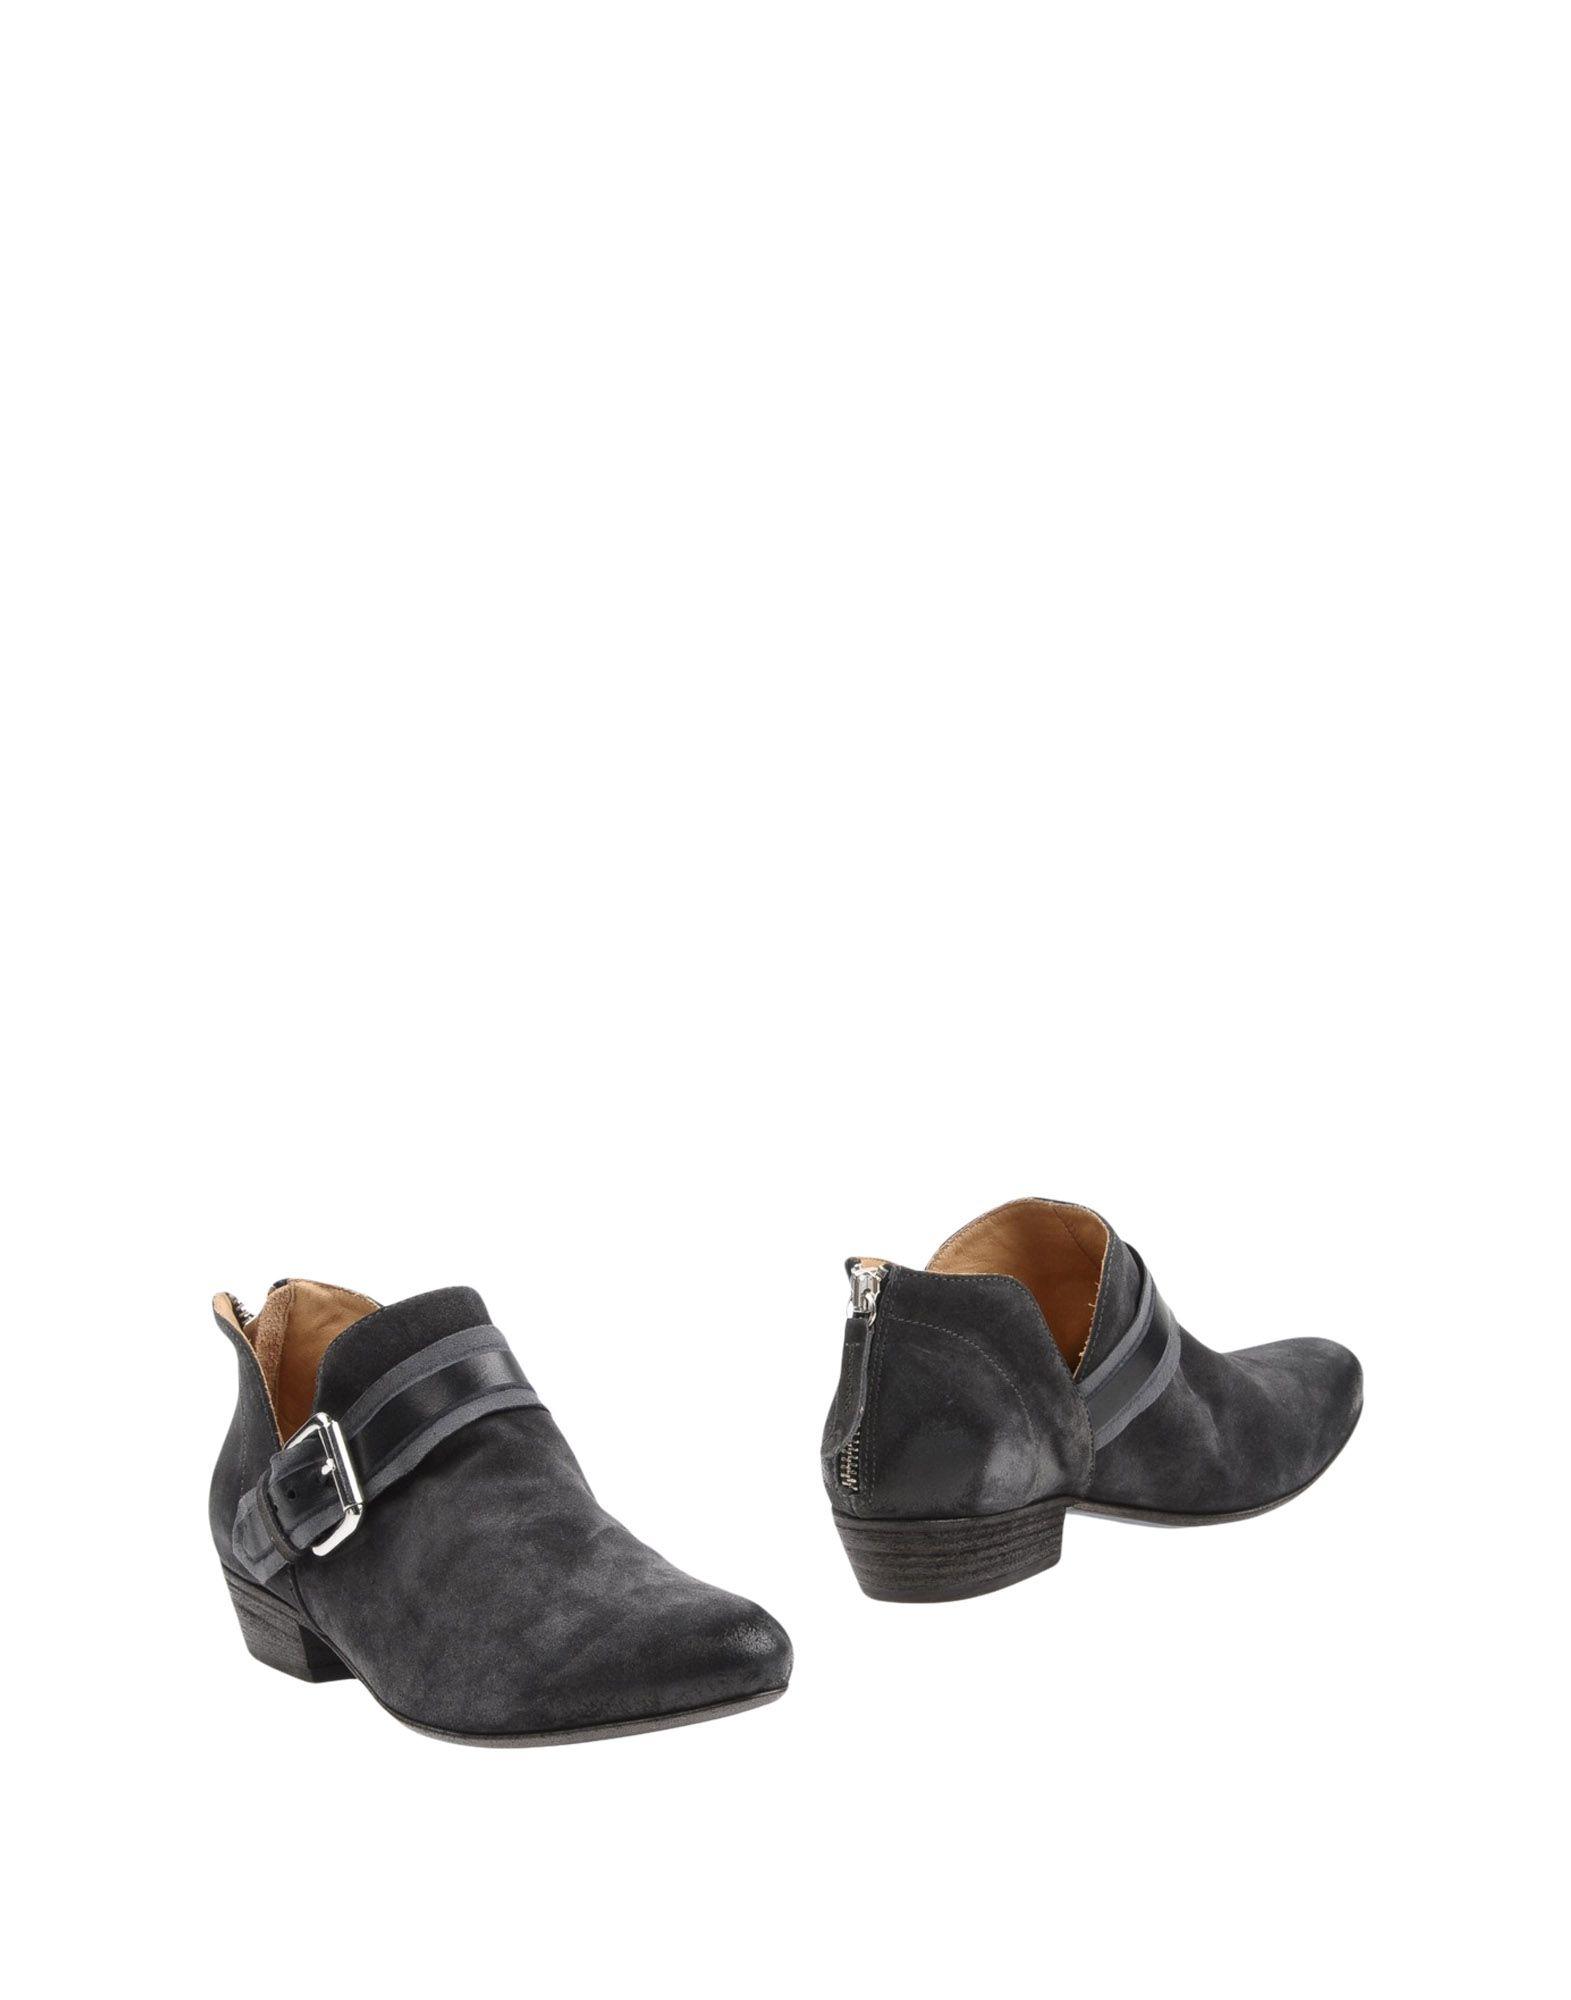 Bottine Garrice Femme - Bottines Garrice Anthracite Chaussures cher femme pas cher Chaussures homme et femme 4cf36a